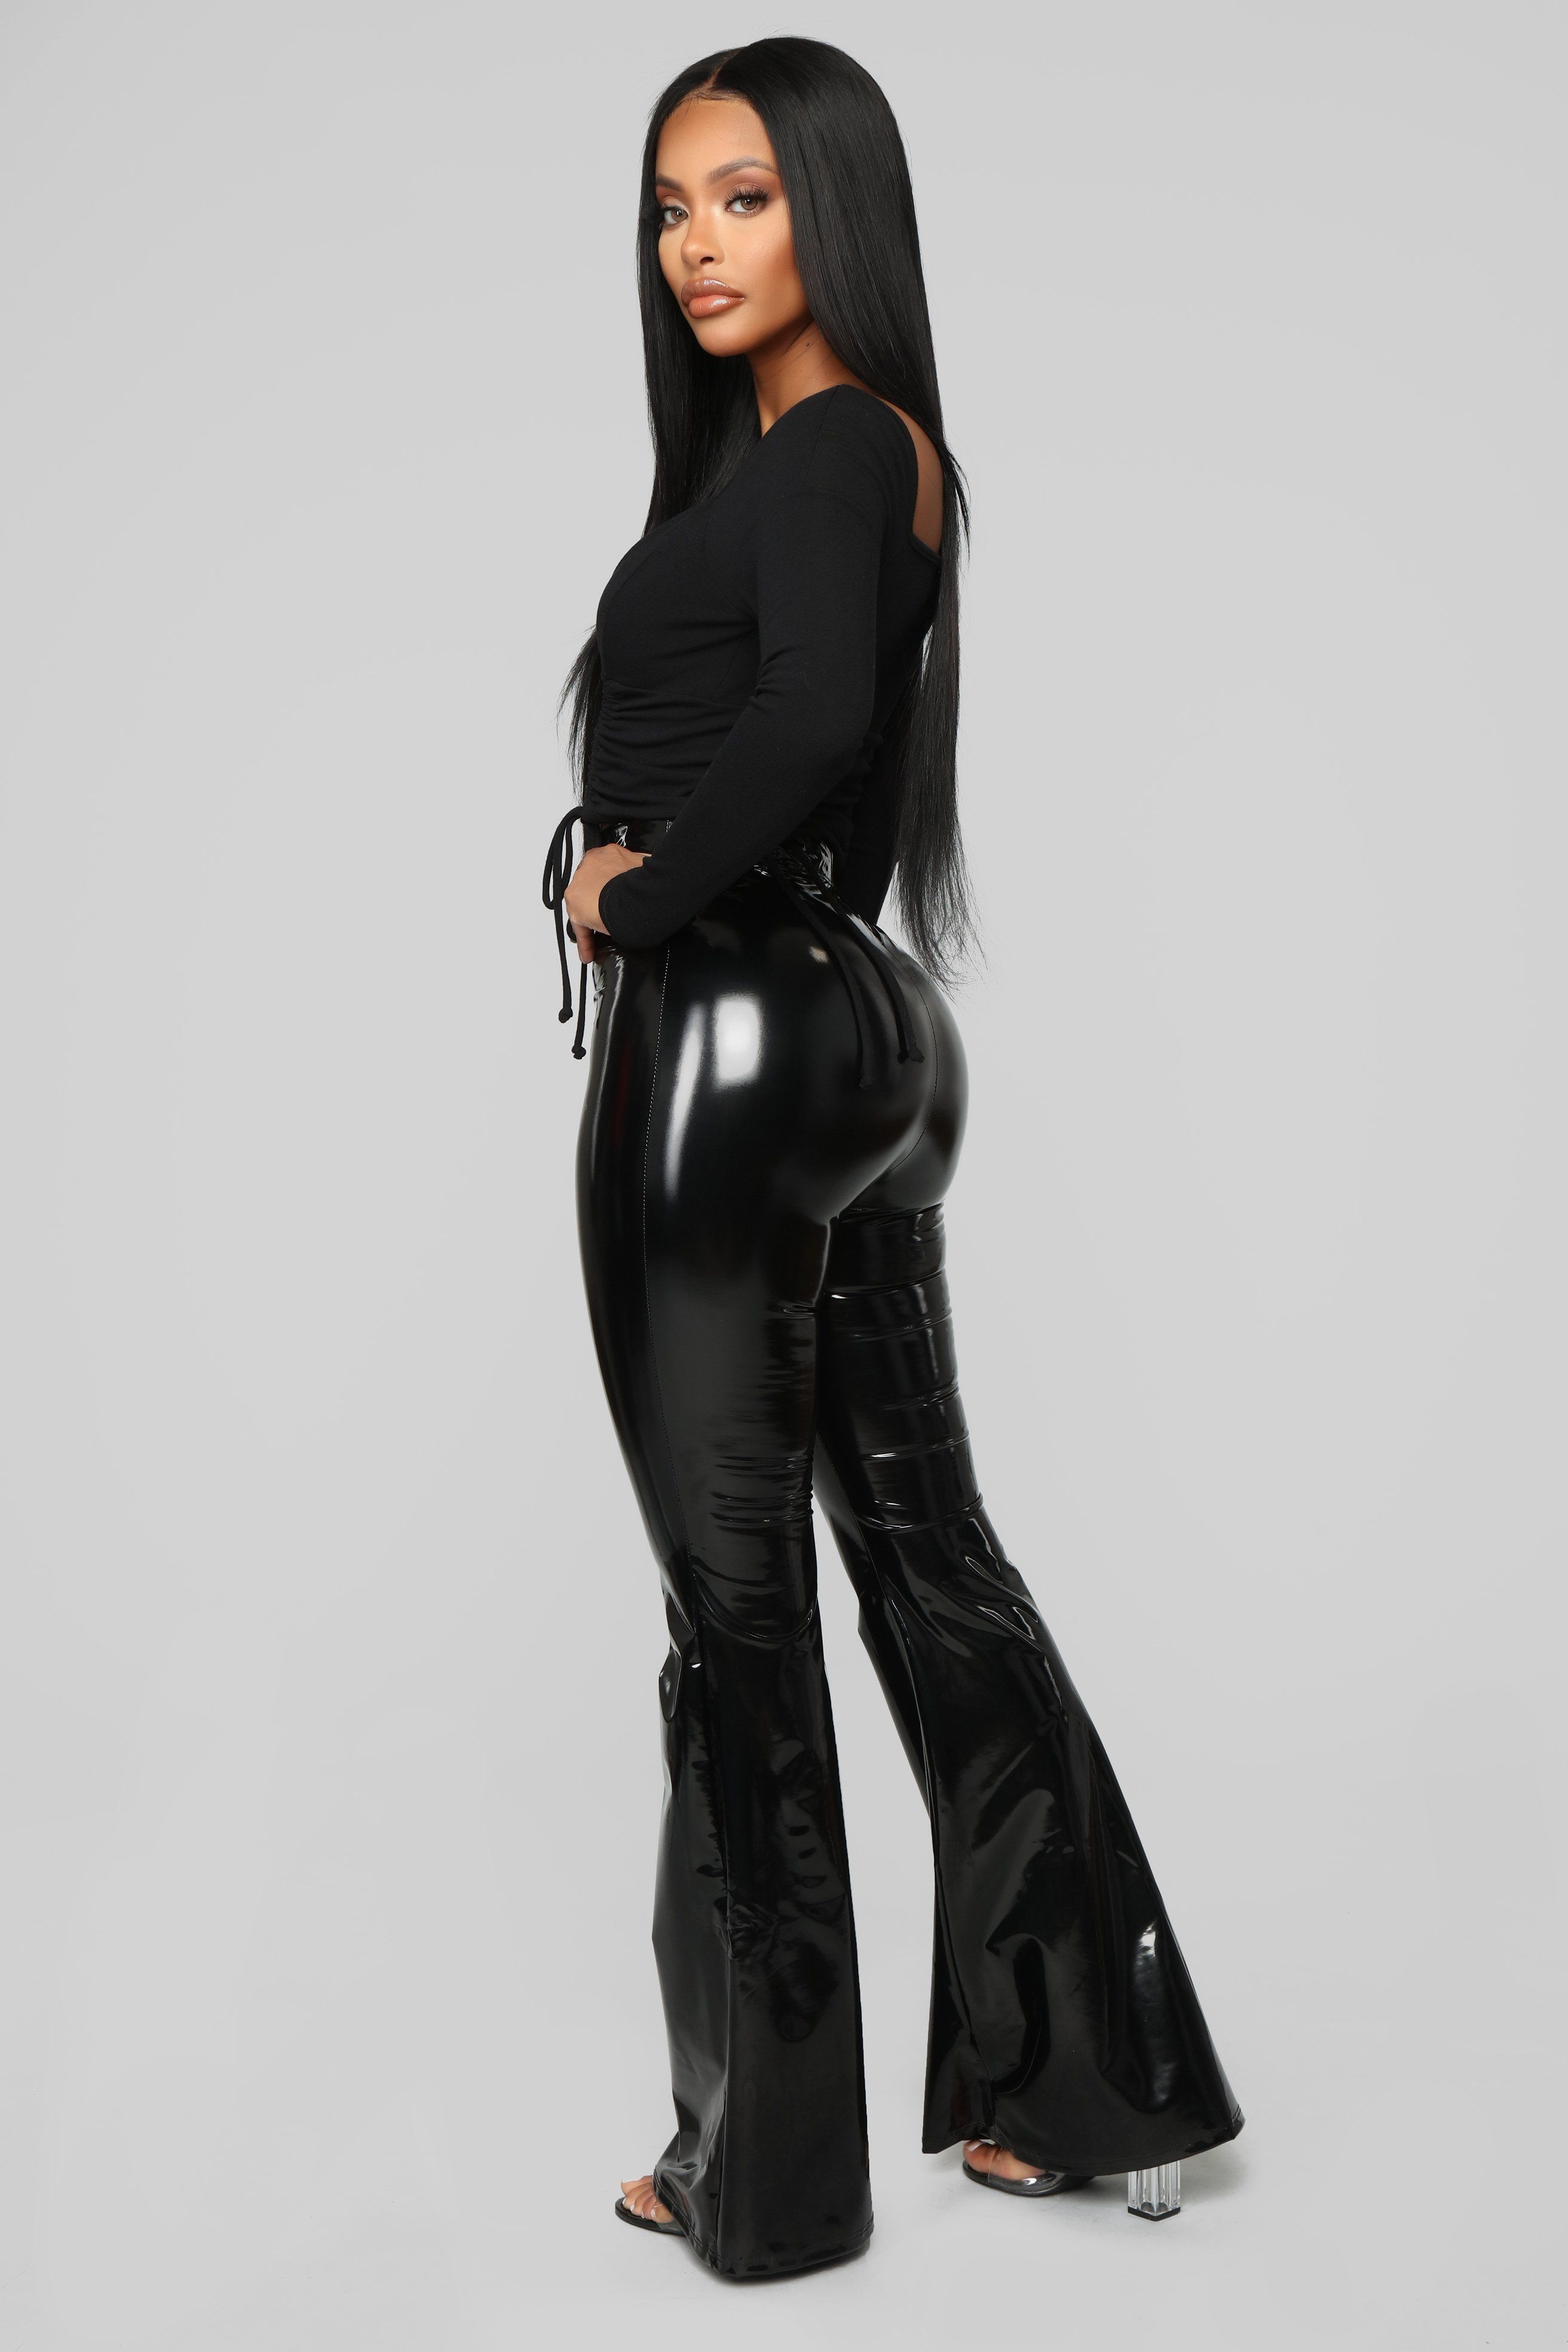 Wild Baby Vinyl Pants Black Fashion, Black pants